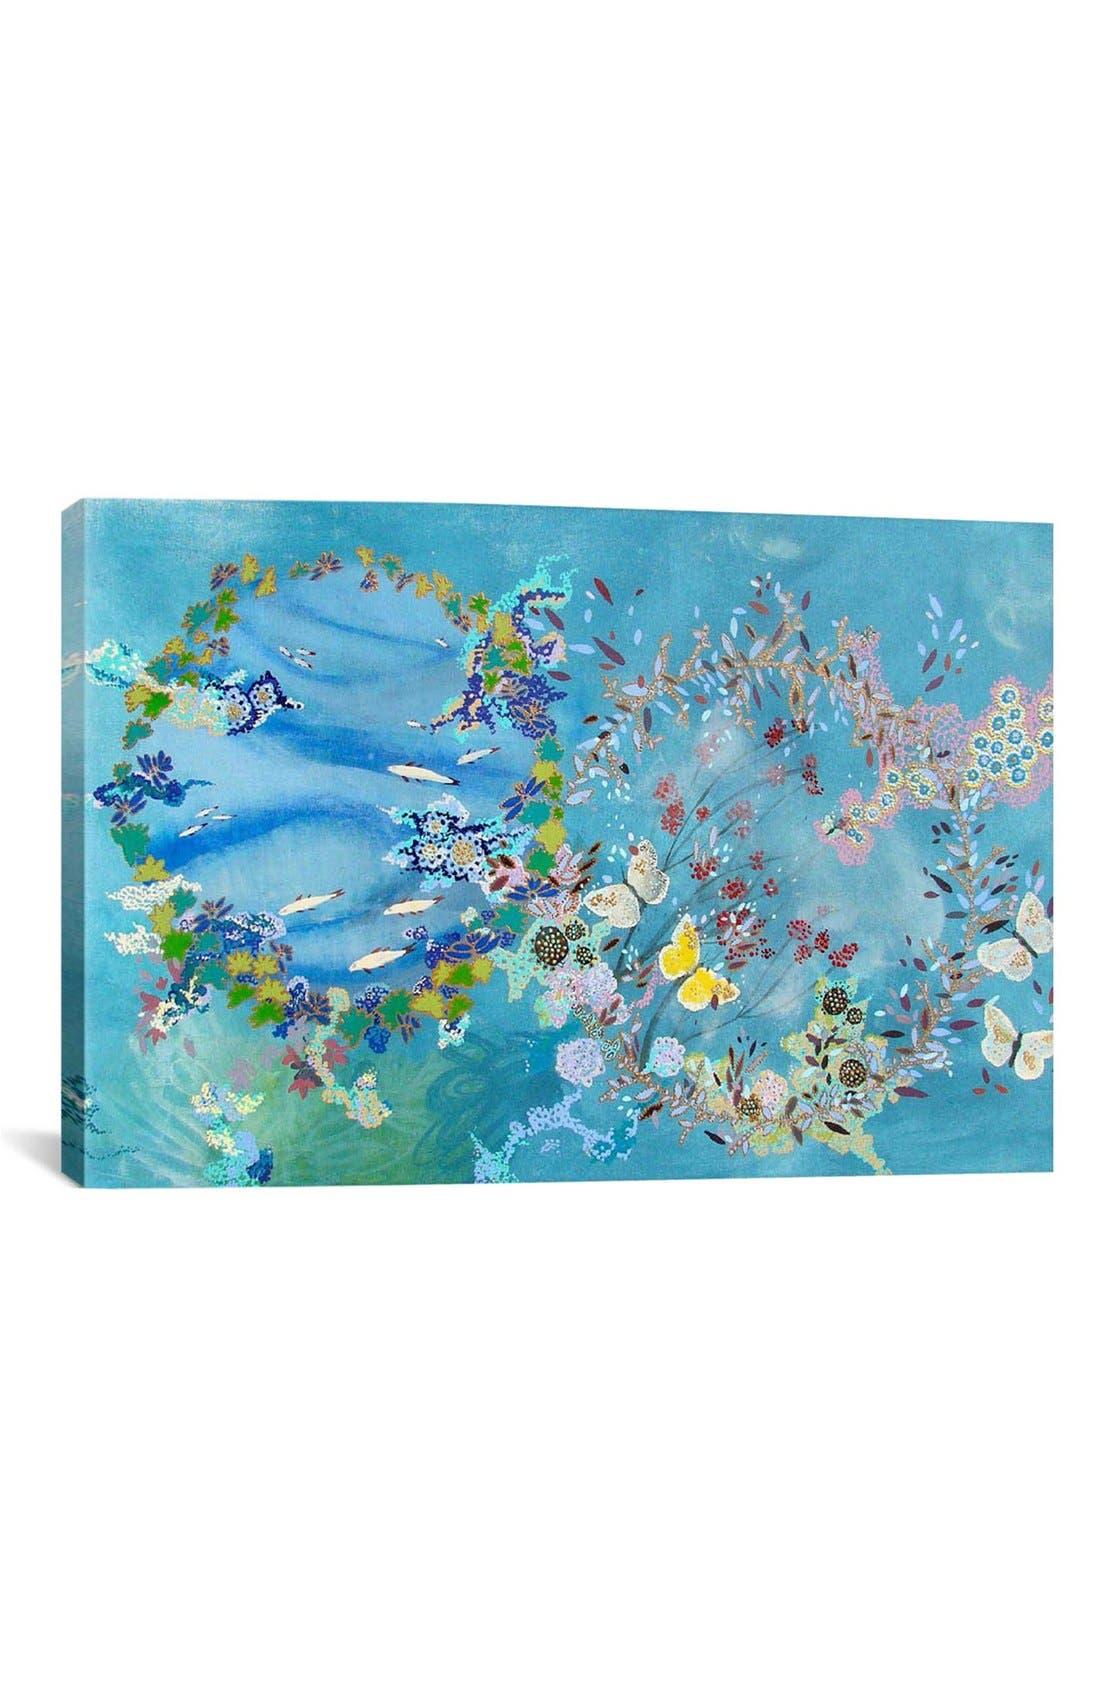 Main Image - iCanvas 'Agua Y Aire - Lia Porto' Giclée Print Canvas Art